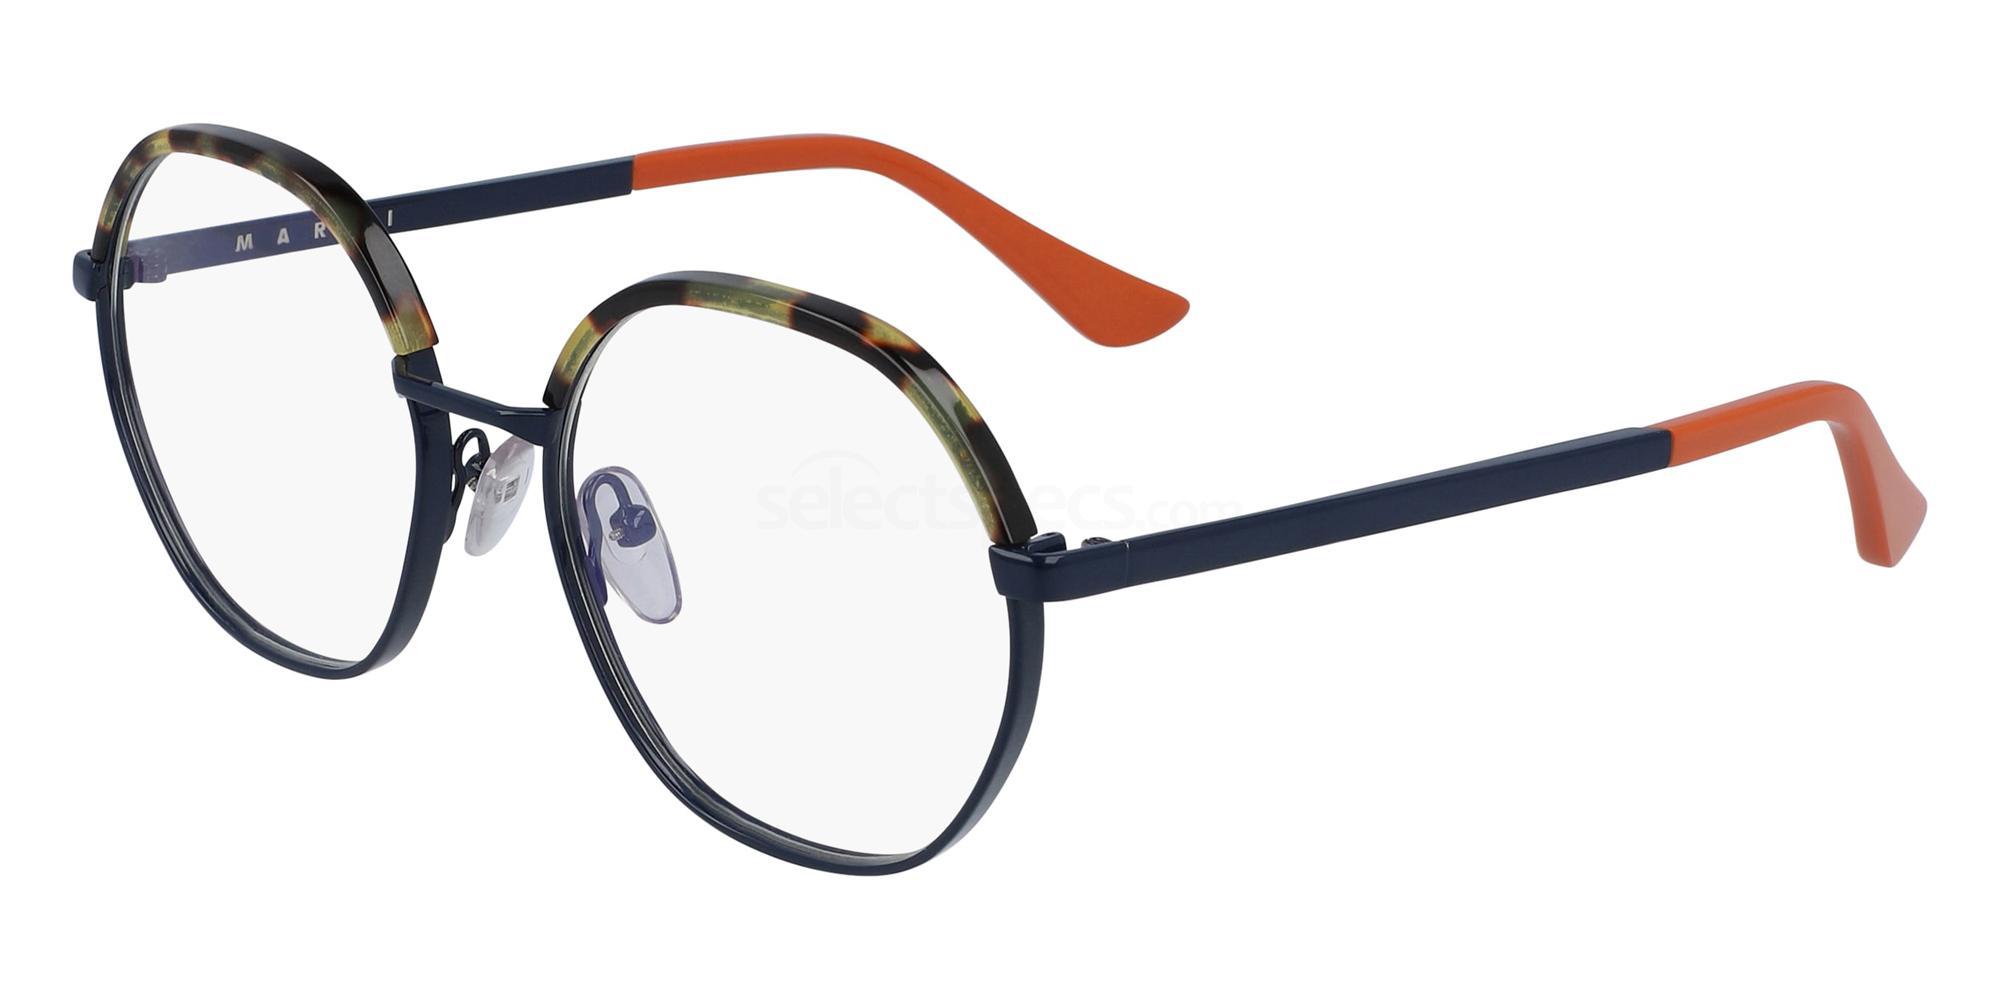 215 ME2109 Glasses, Marni